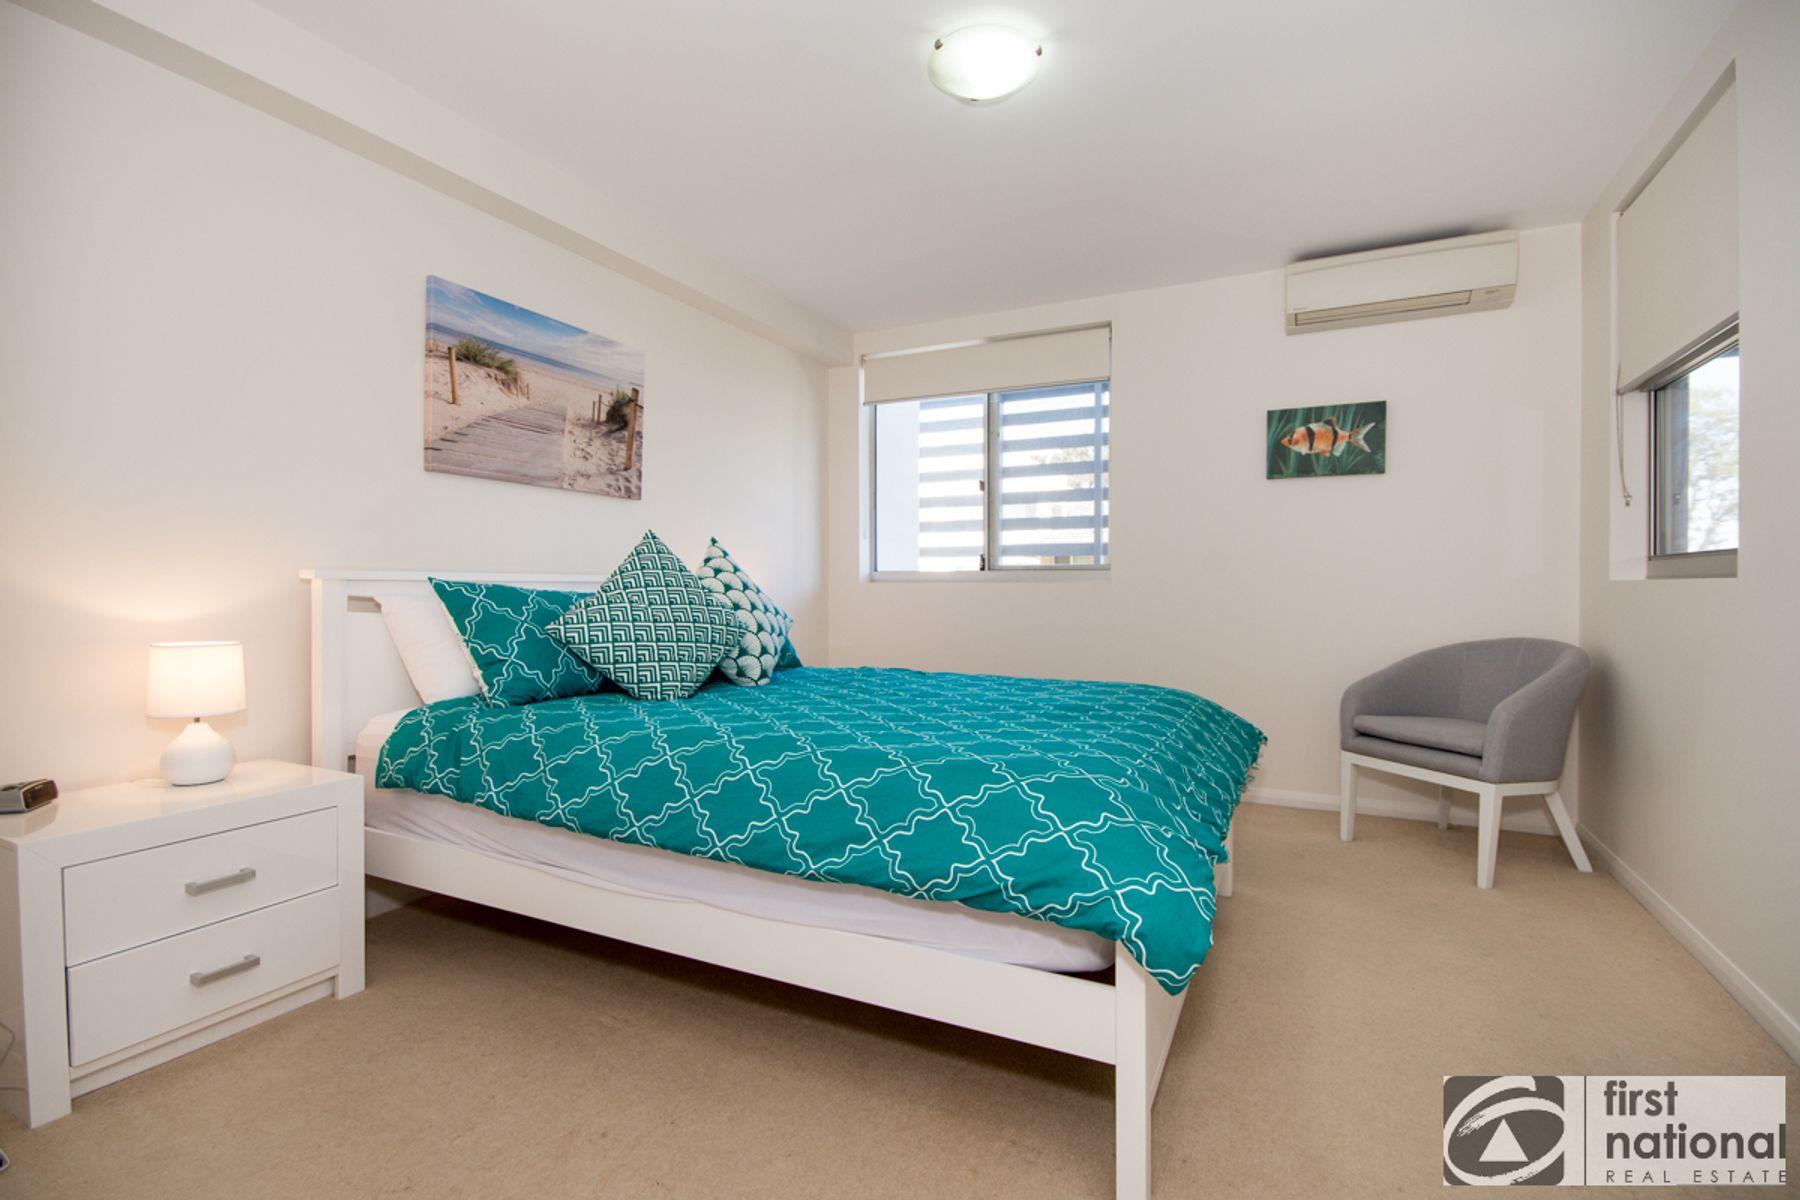 22/52 Bestman Avenue, Bongaree, QLD 4507